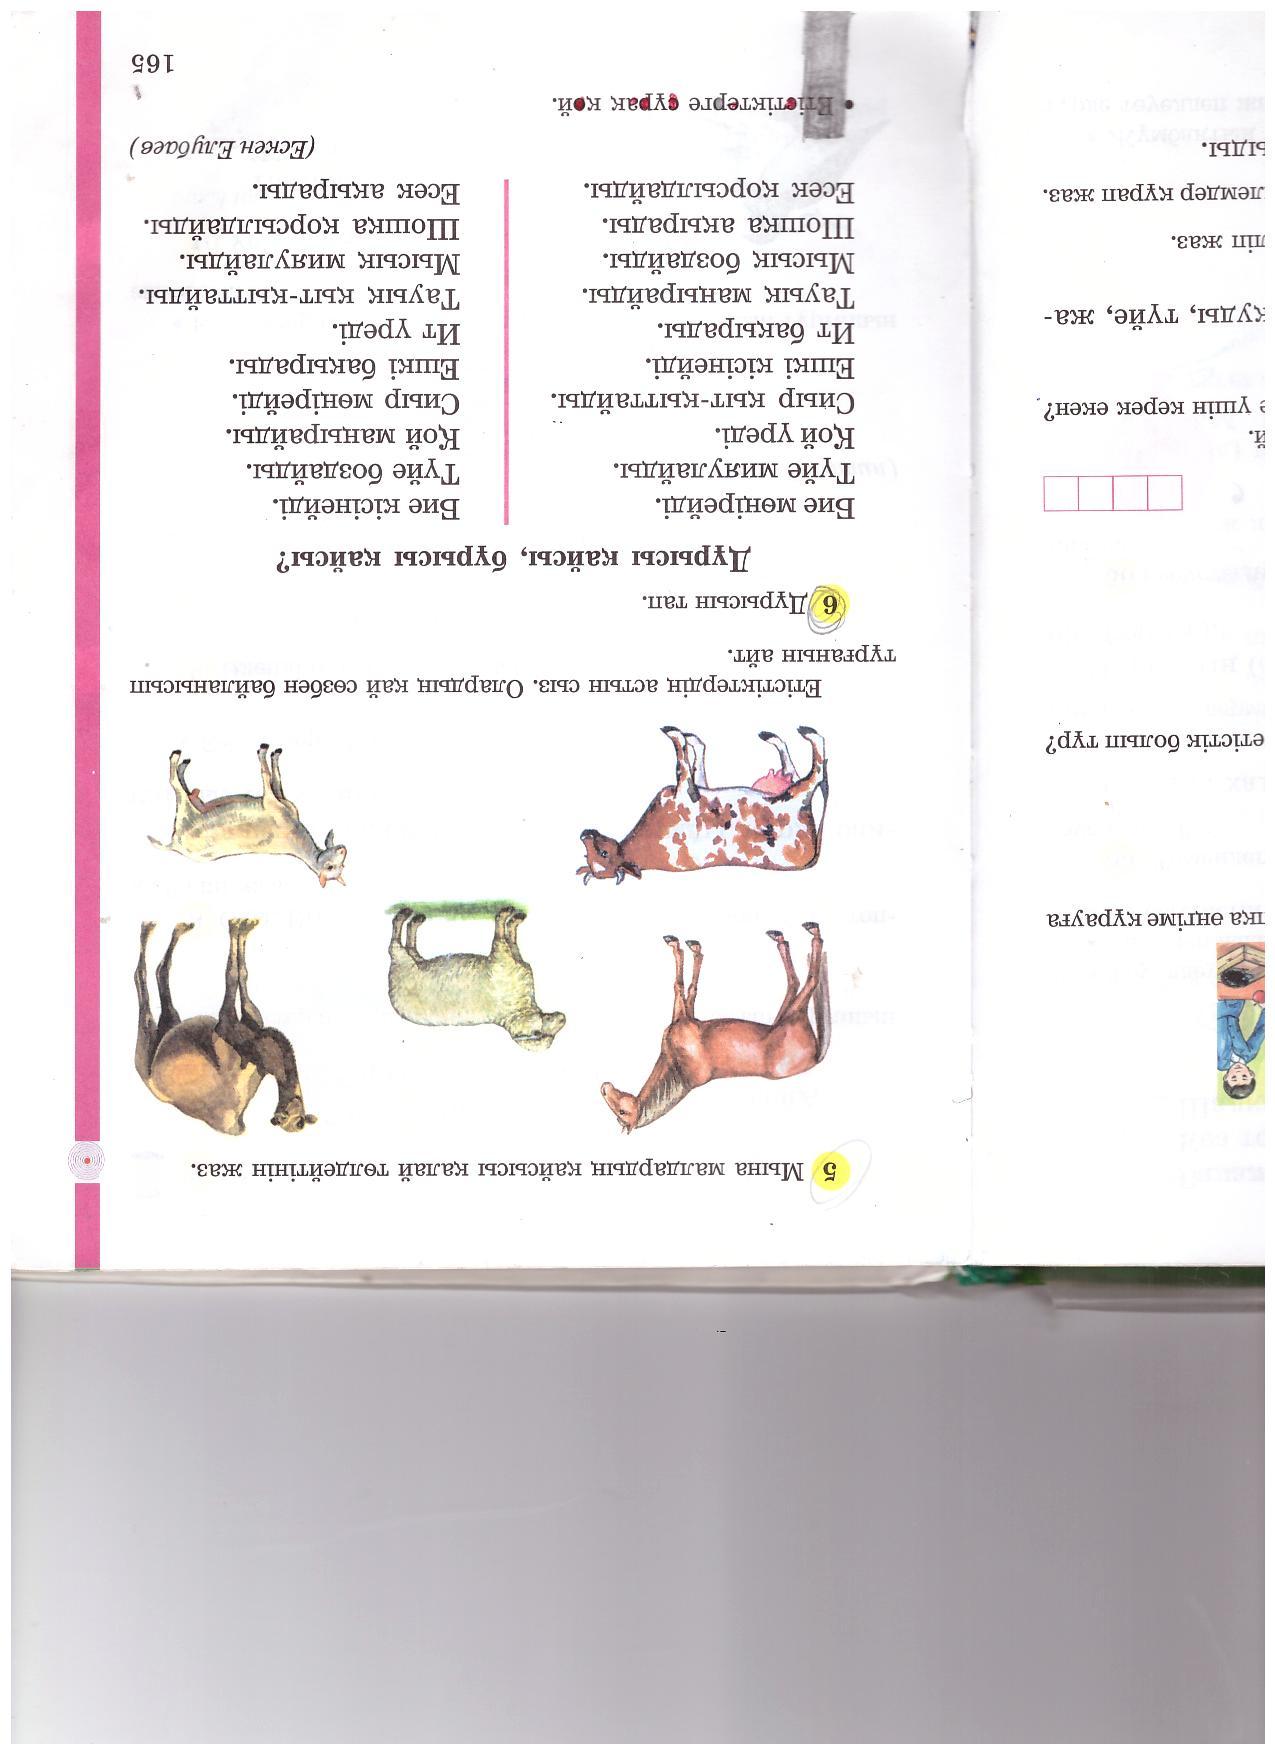 C:\Documents and Settings\User\Мои документы\Мои рисунки\Изображение 116.jpg